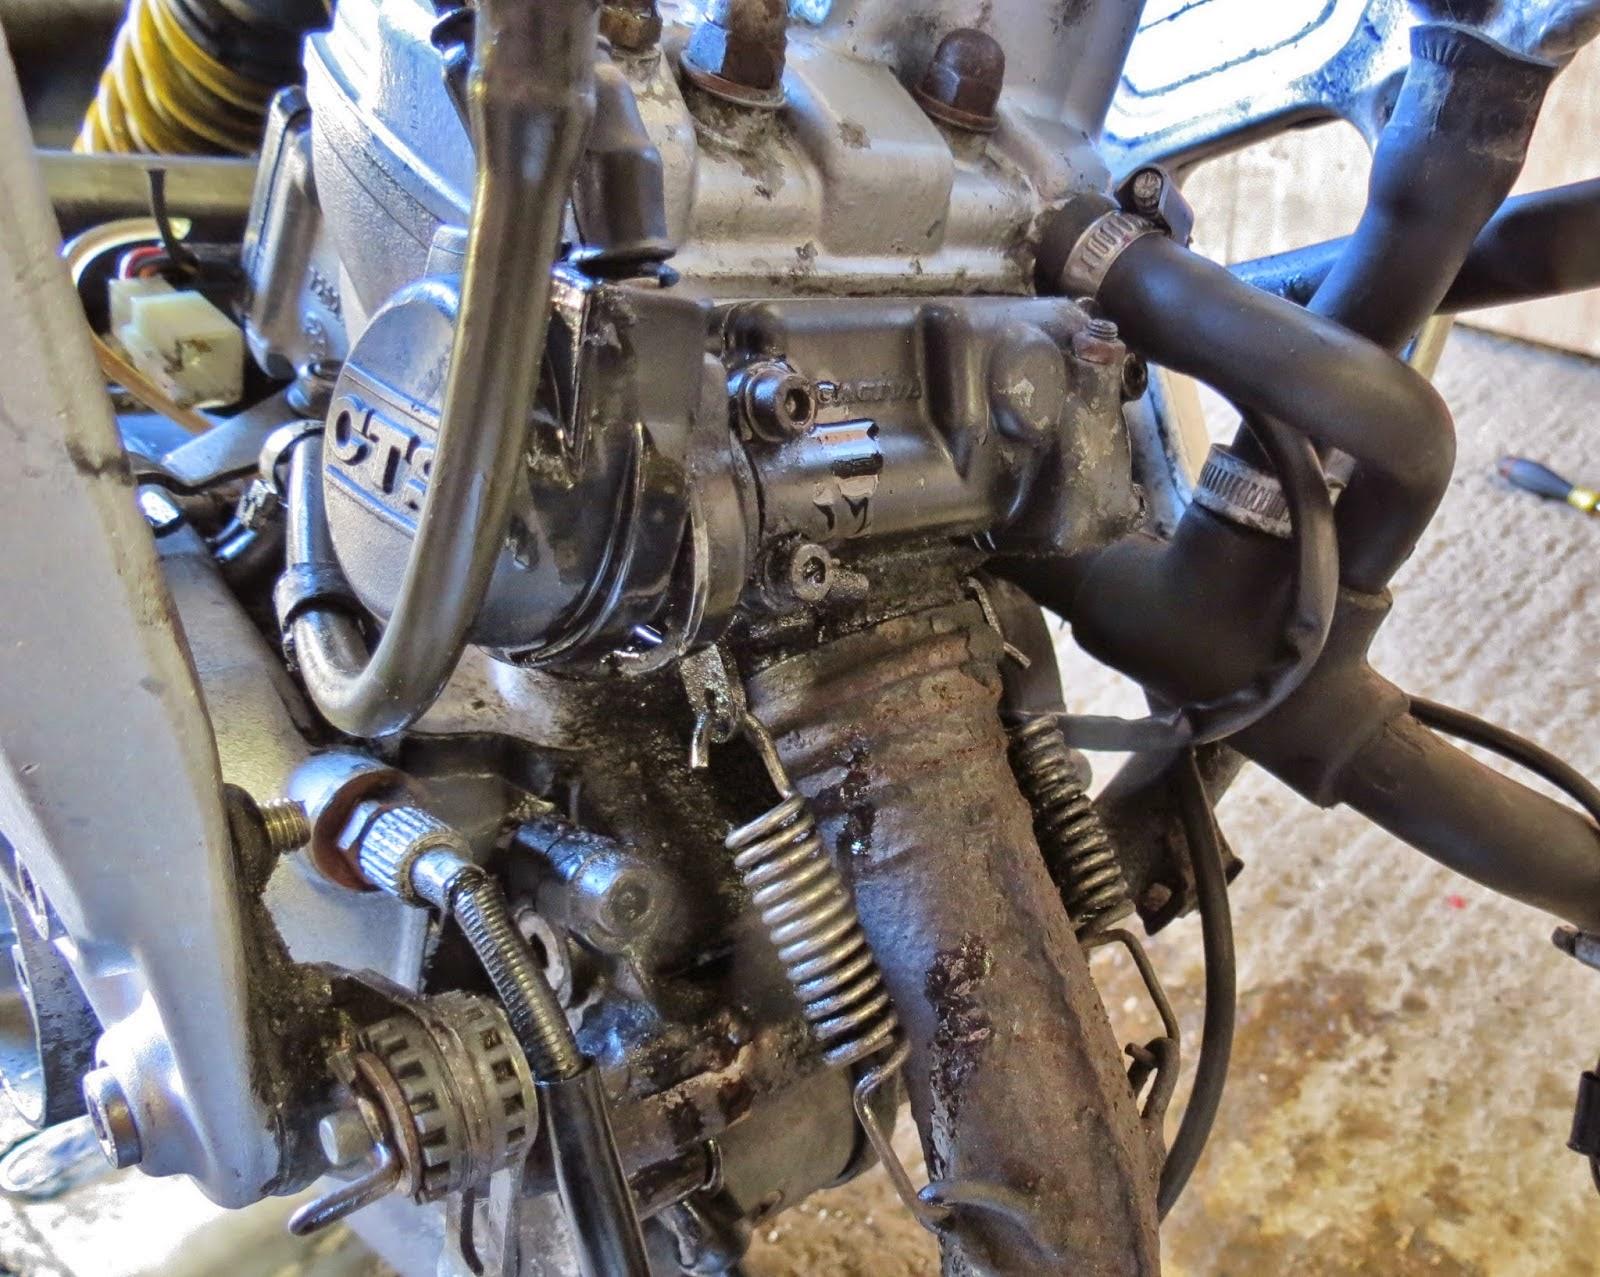 Cagiva Mito 125 Owners Blog   Cagiva Mito 125 Exhaust Removal